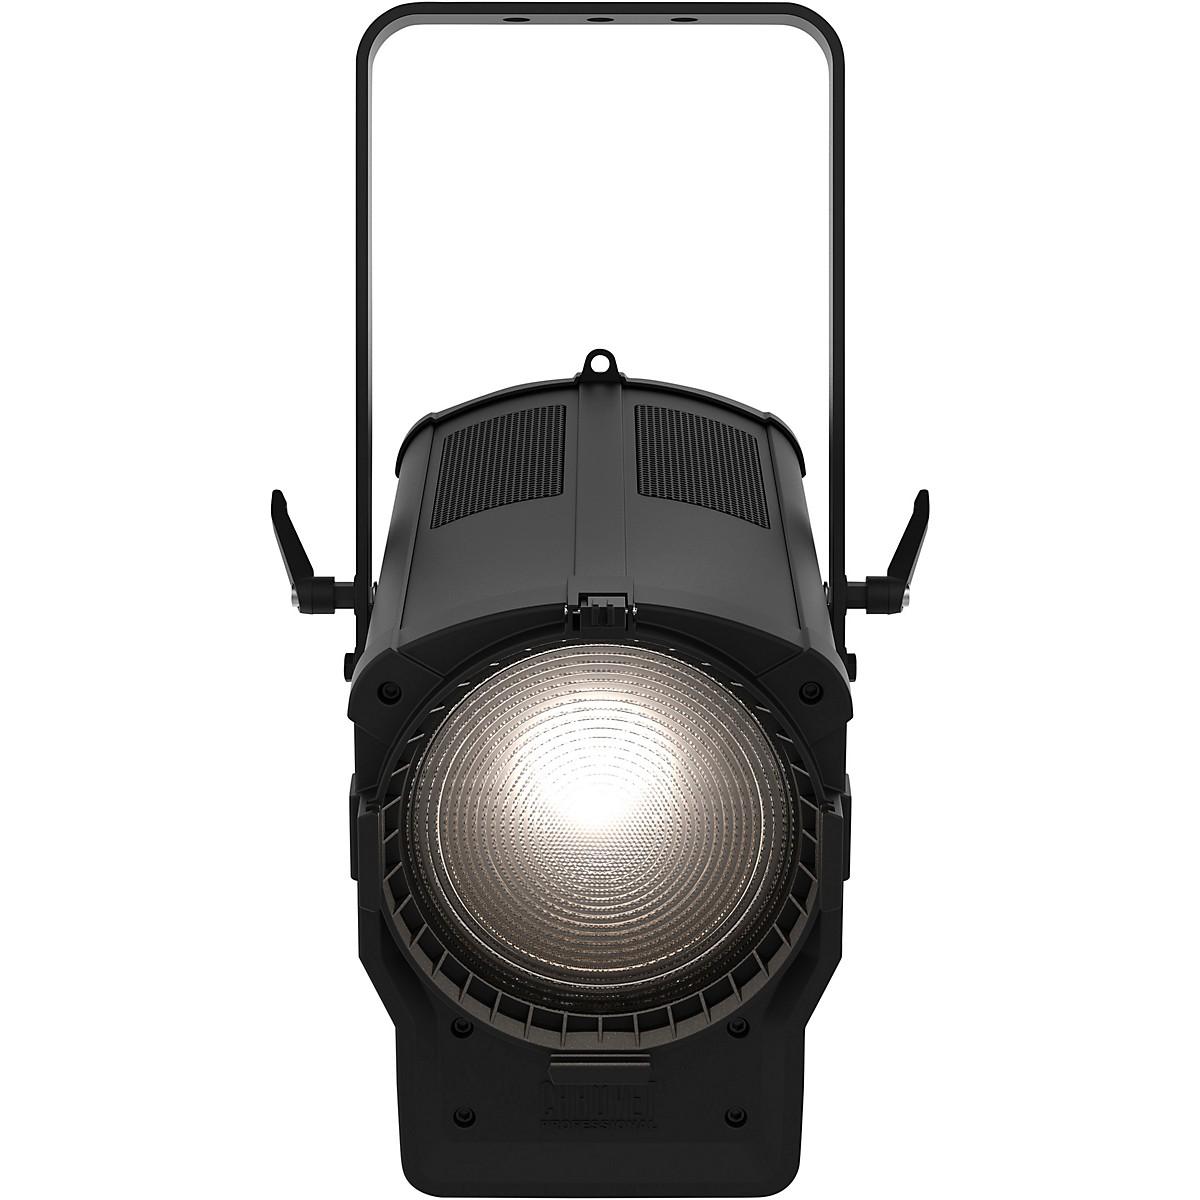 CHAUVET Professional Ovation F-915VW Variable White LED Light